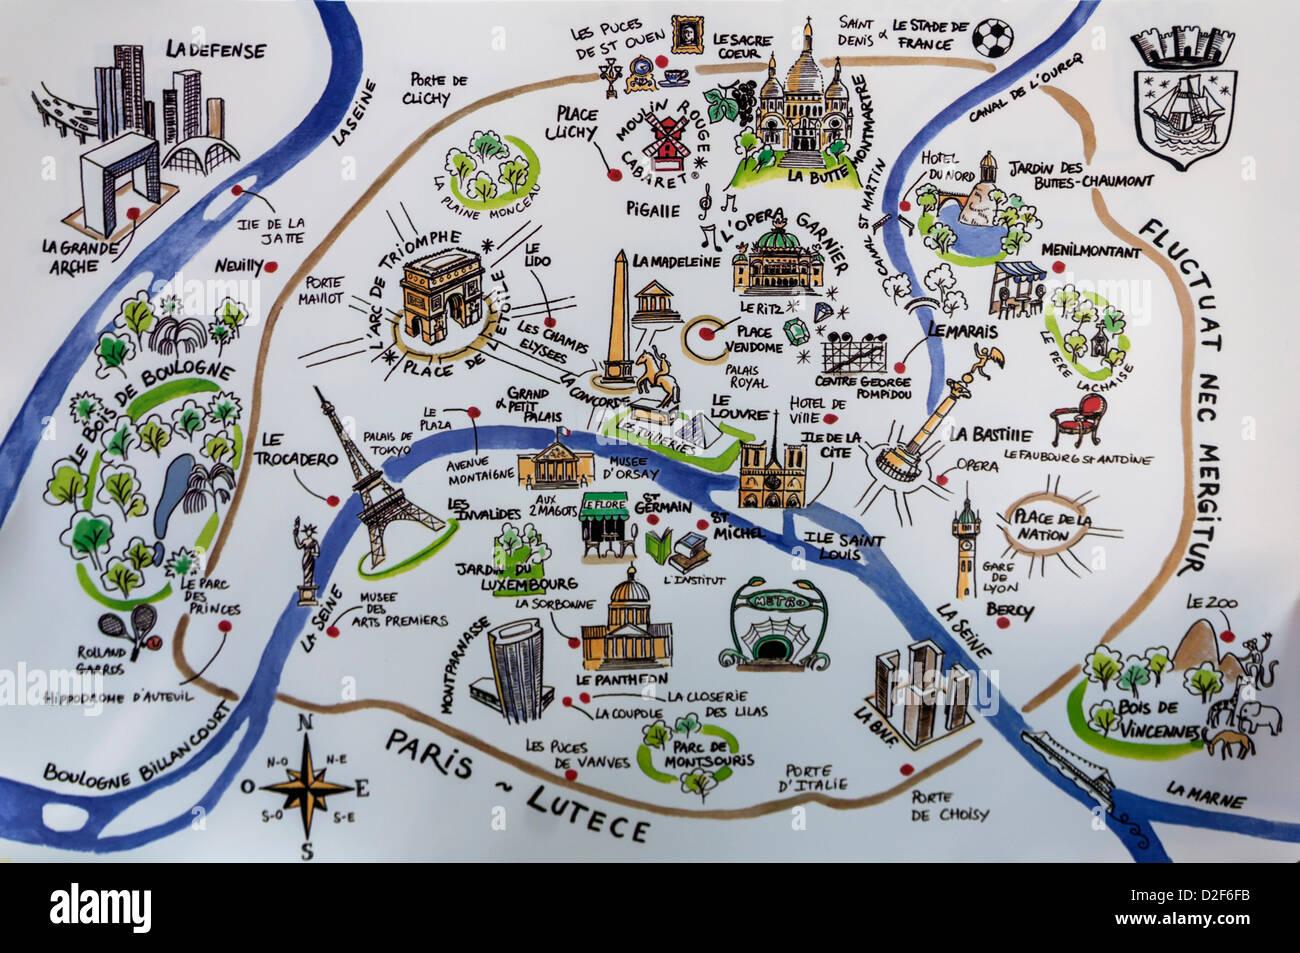 Paris City Map Stockfotos & Paris City Map Bilder - Alamy